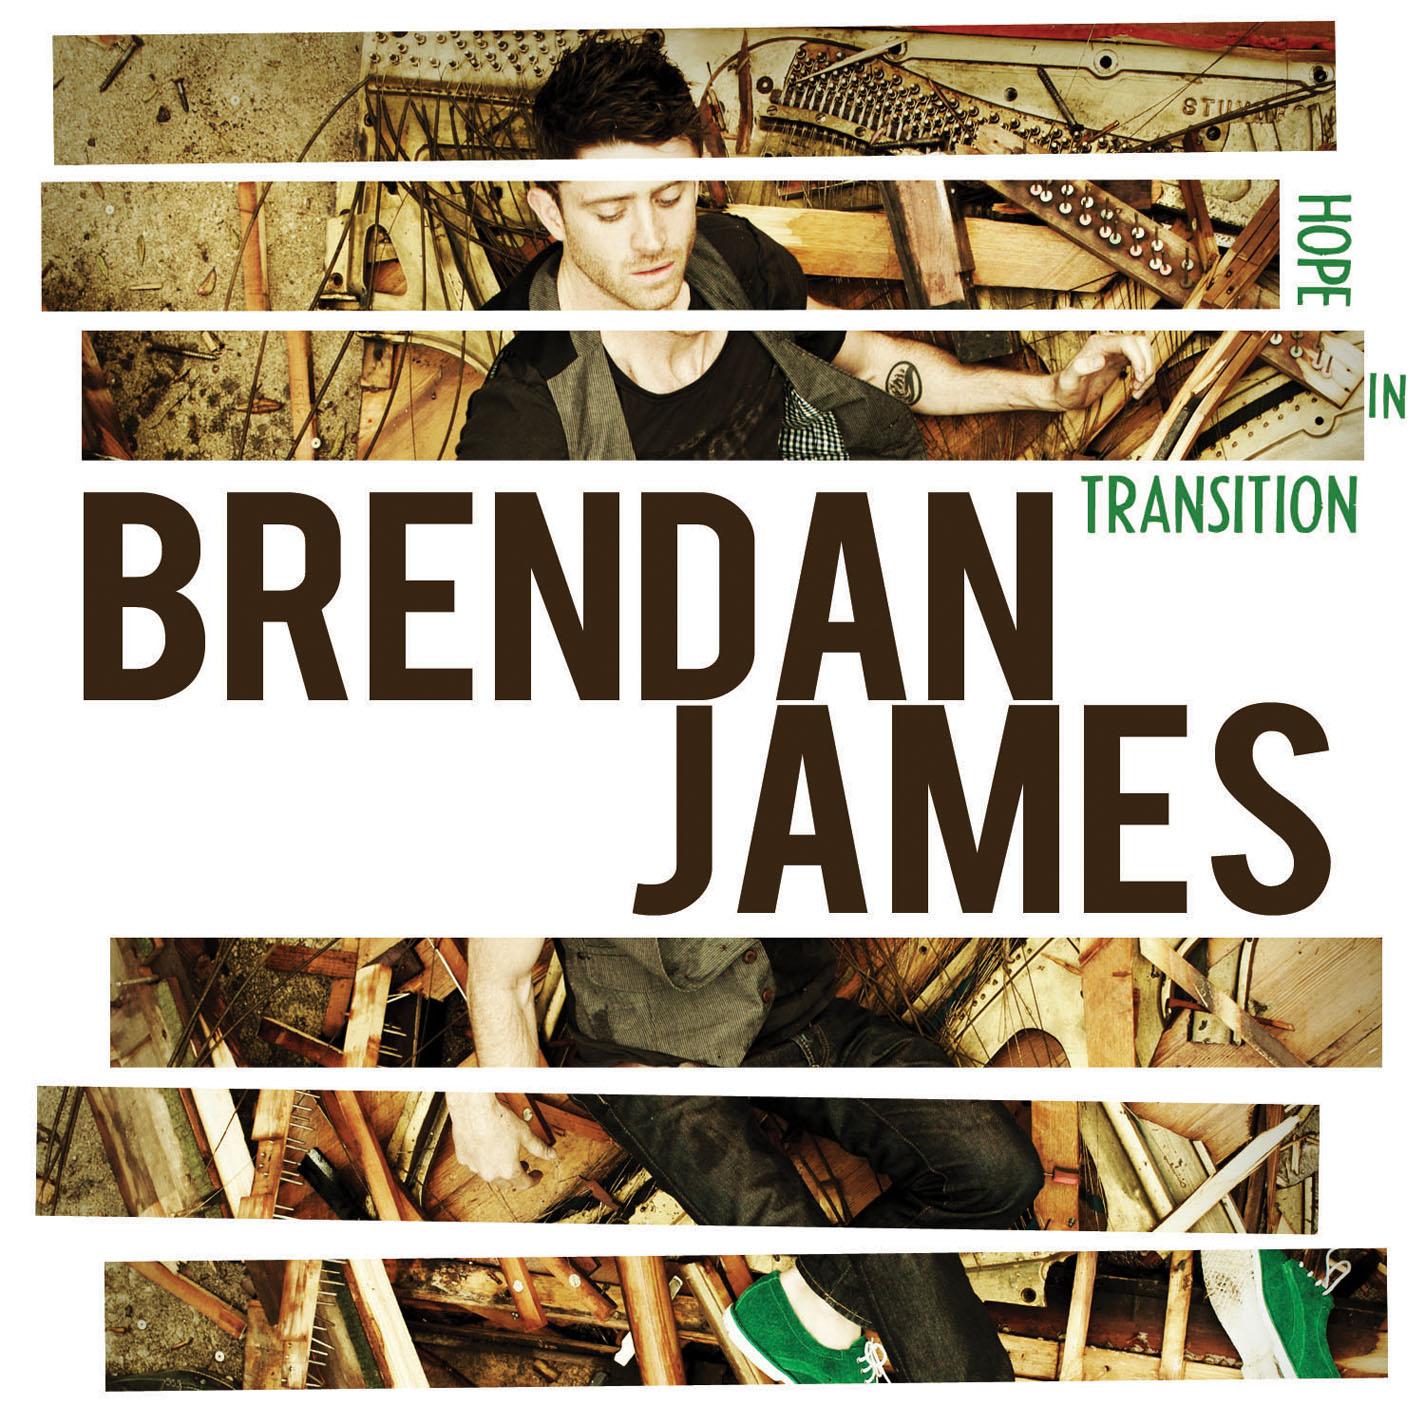 Brendan James - Hope In Transition